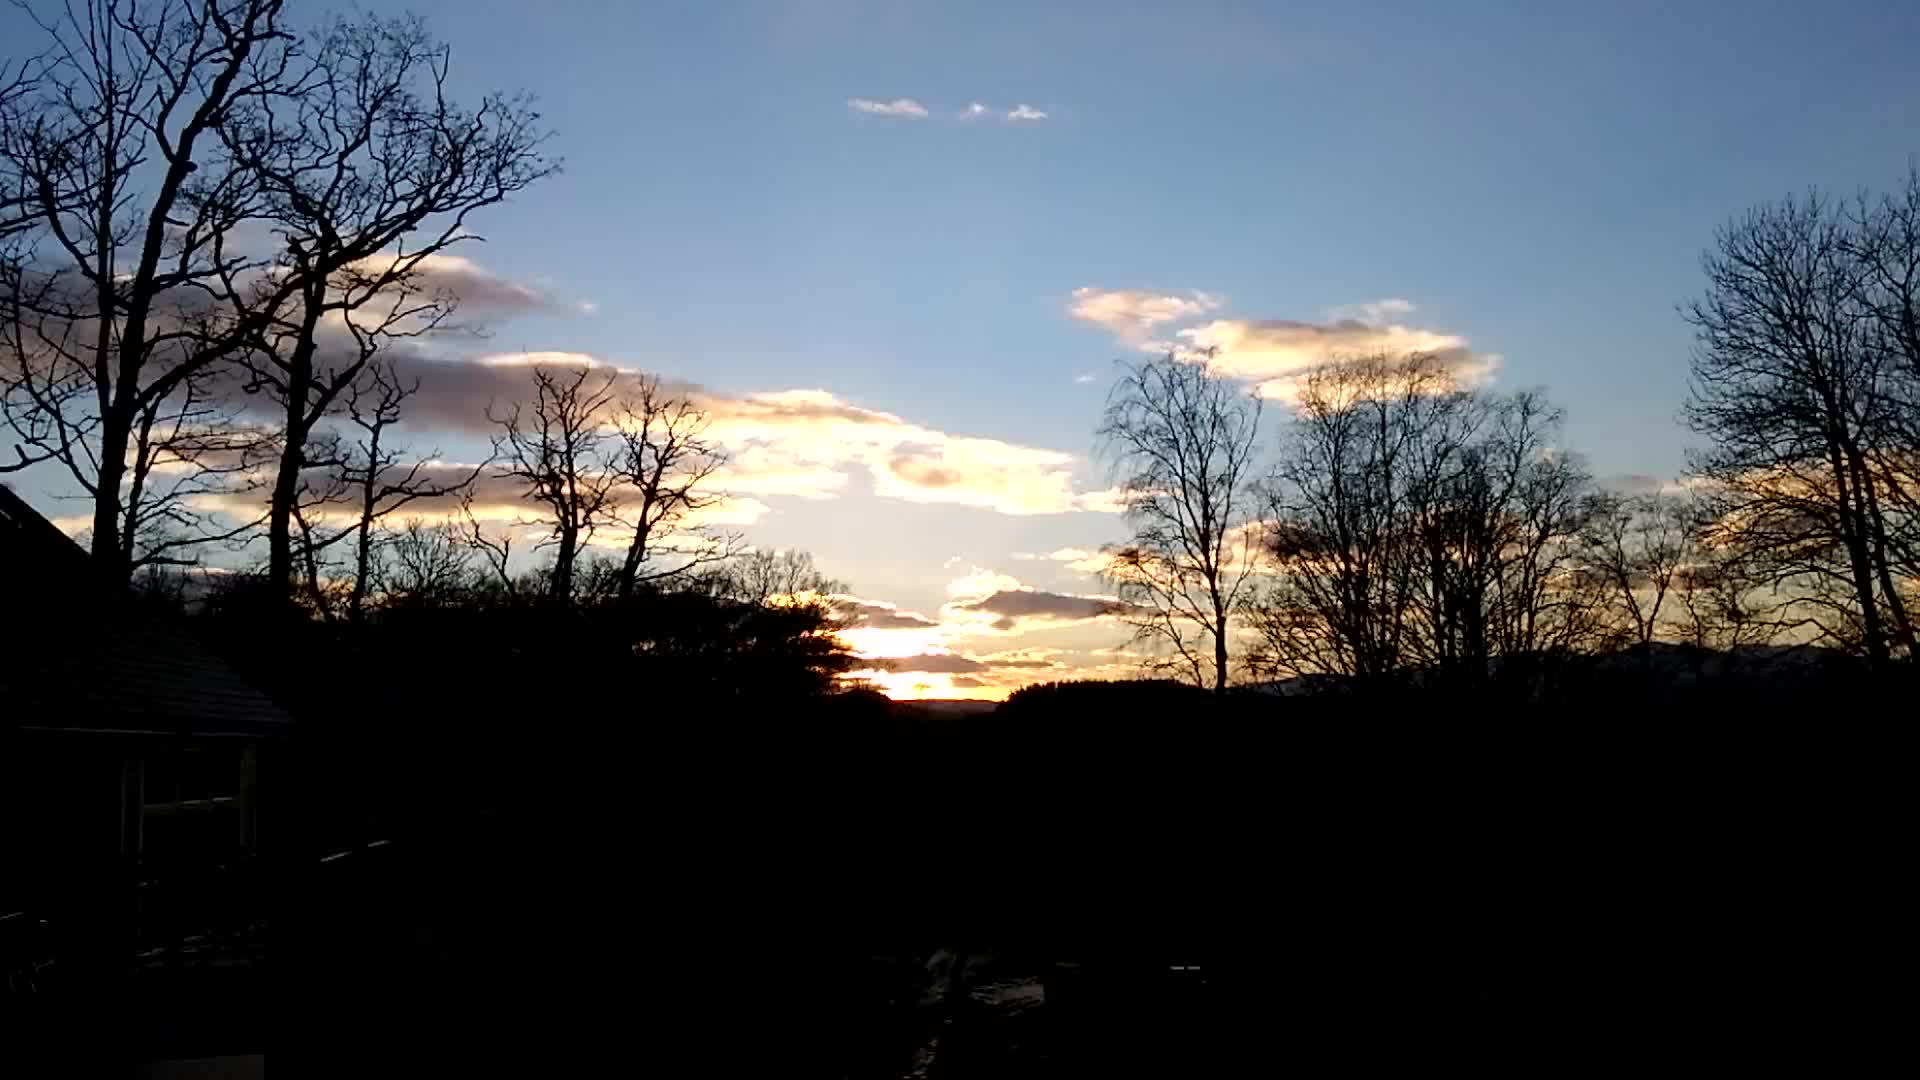 weathergifs, Sunset time lapse, Crieff GIFs